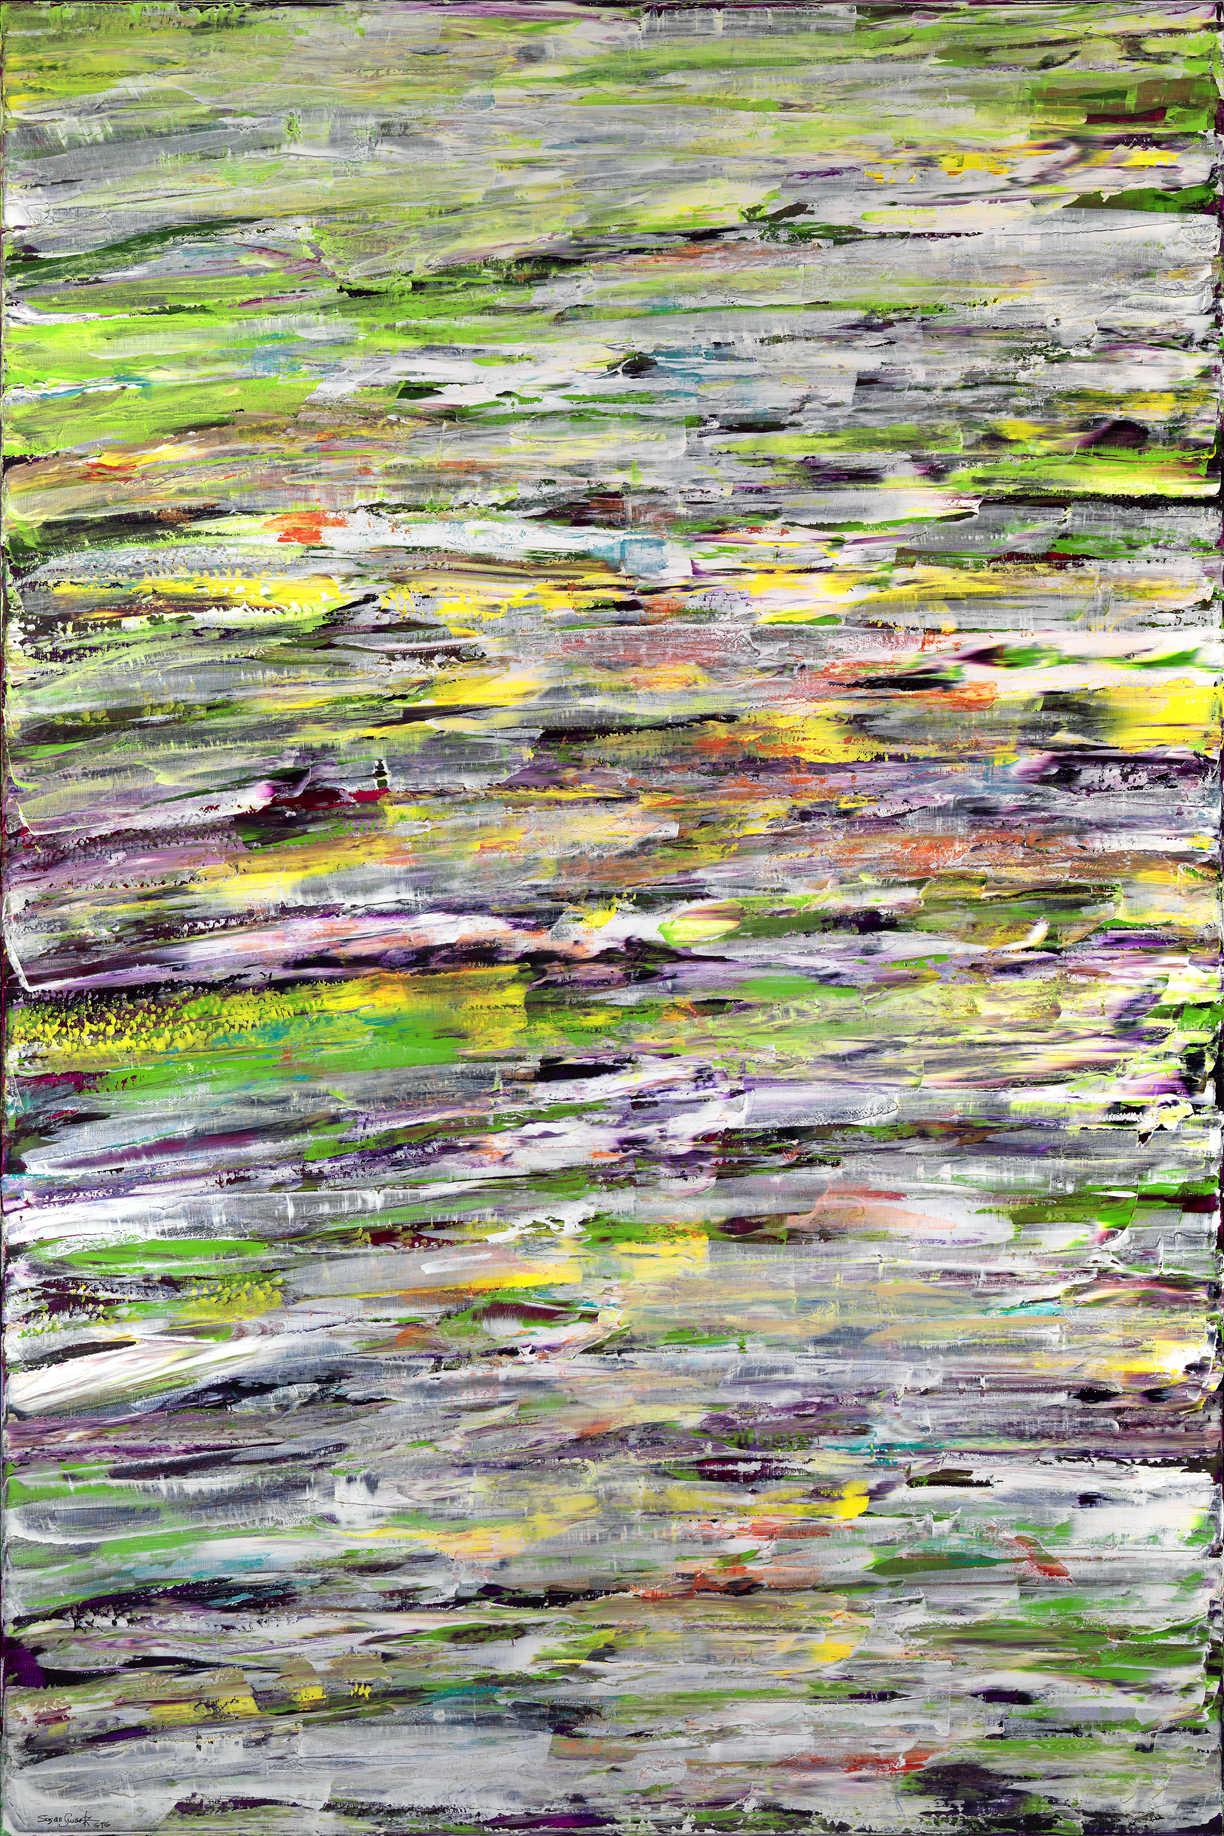 Serenade of Lilies 3  48 x 72 in, 122 x 183 cm